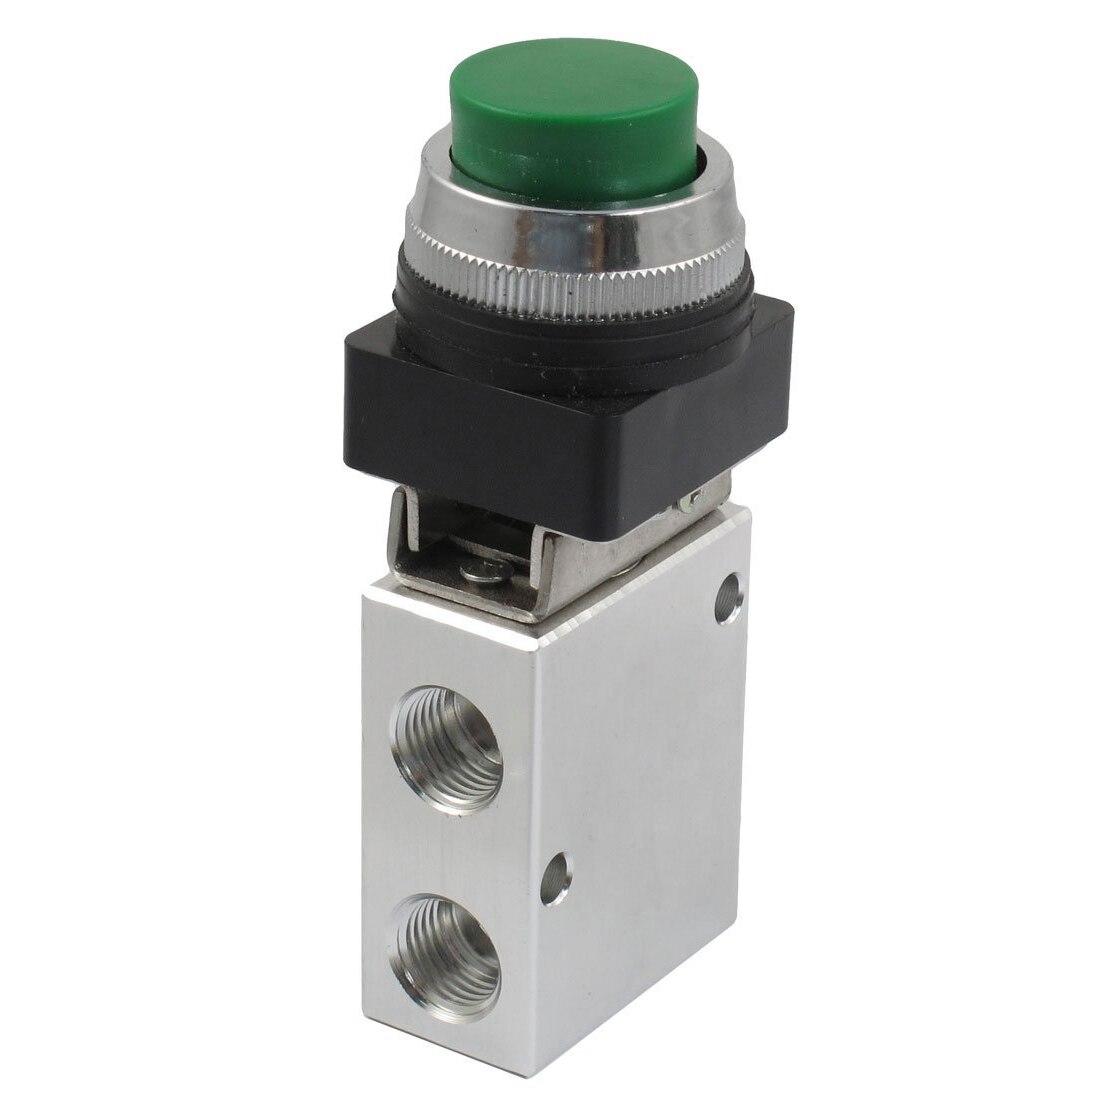 JFBL Hot JM-322PPL 13mm Thread 2 Position 3 Way Green Push Button Air Mechanical Valve air conditioner part 3 way valve 1 4npt thread single manifold gauge 220psi